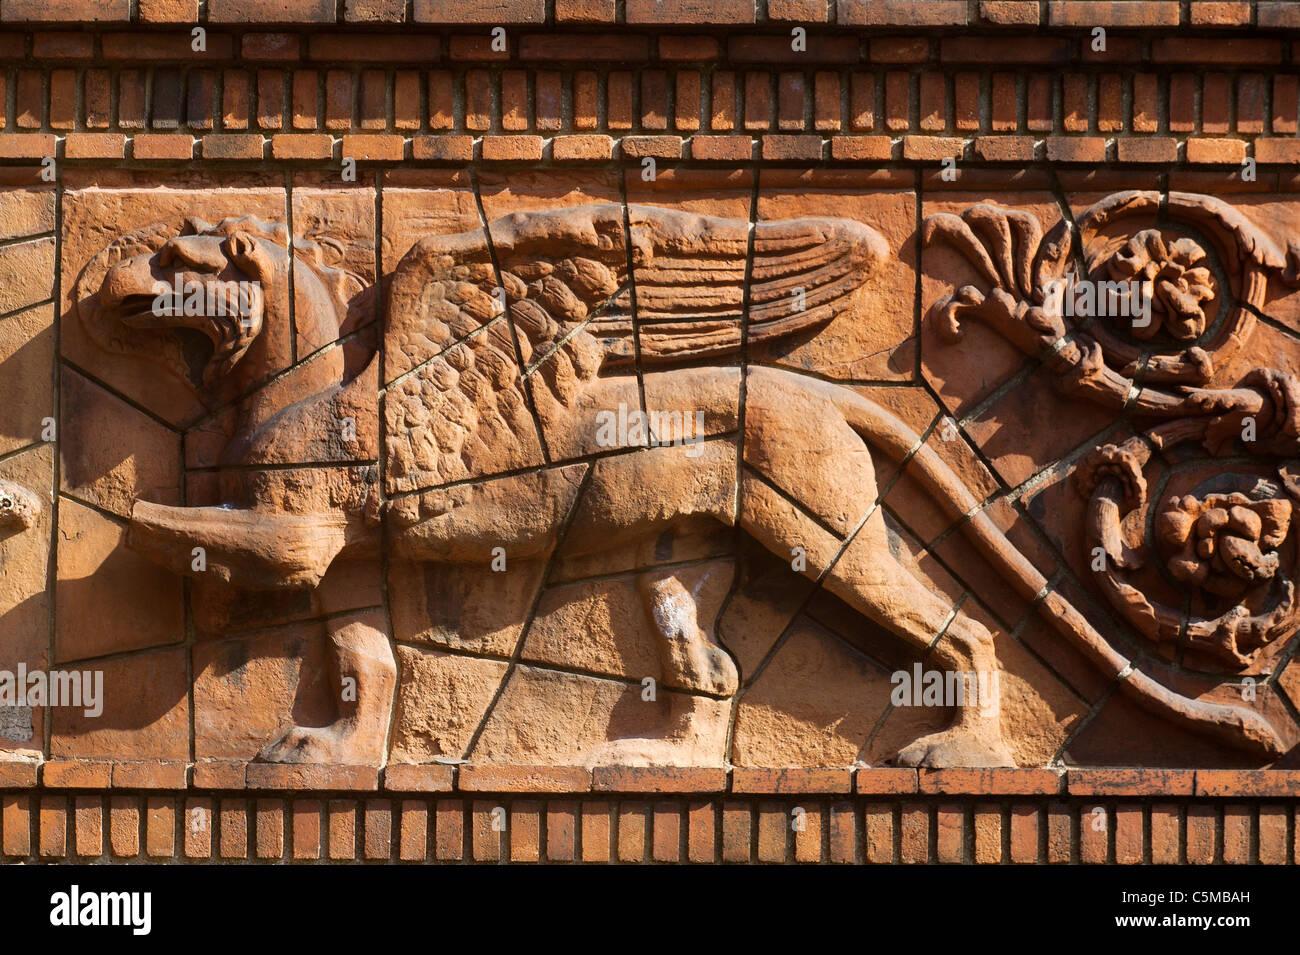 University Of Arts and Archeology, Paris, France - Stock Image